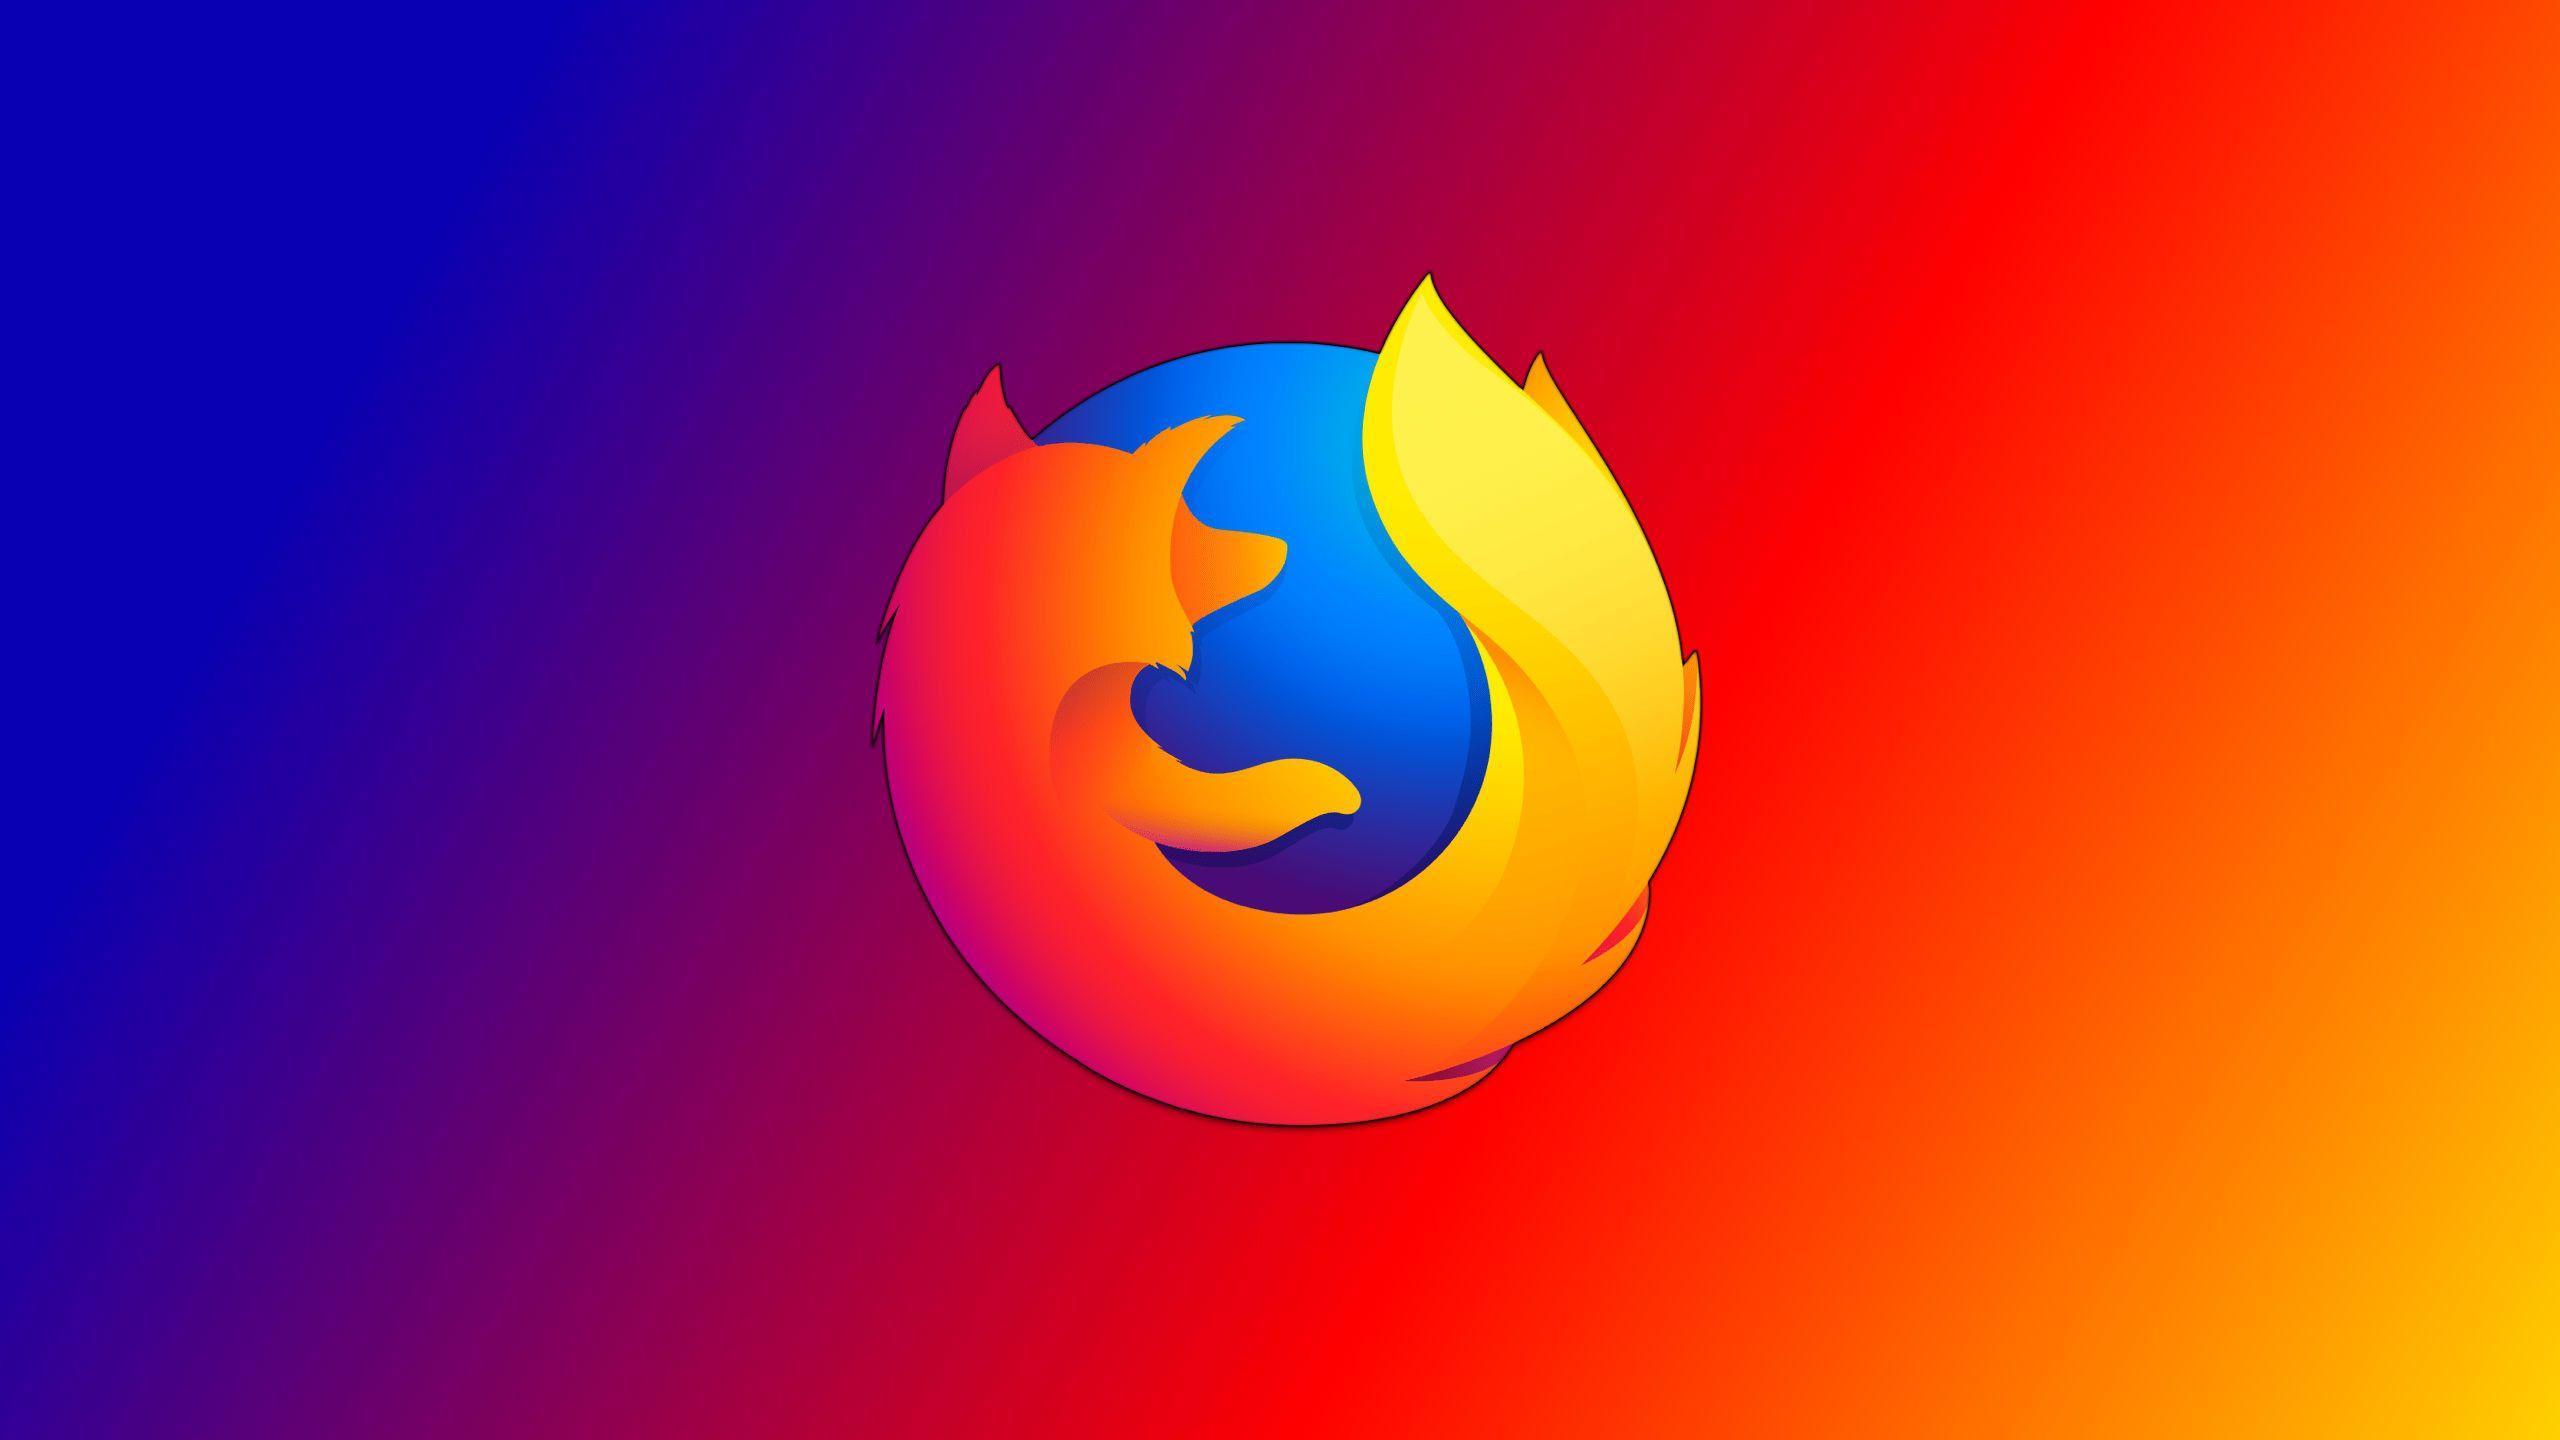 Firefox Wallpapers Top Free Firefox Backgrounds Wallpaperaccess